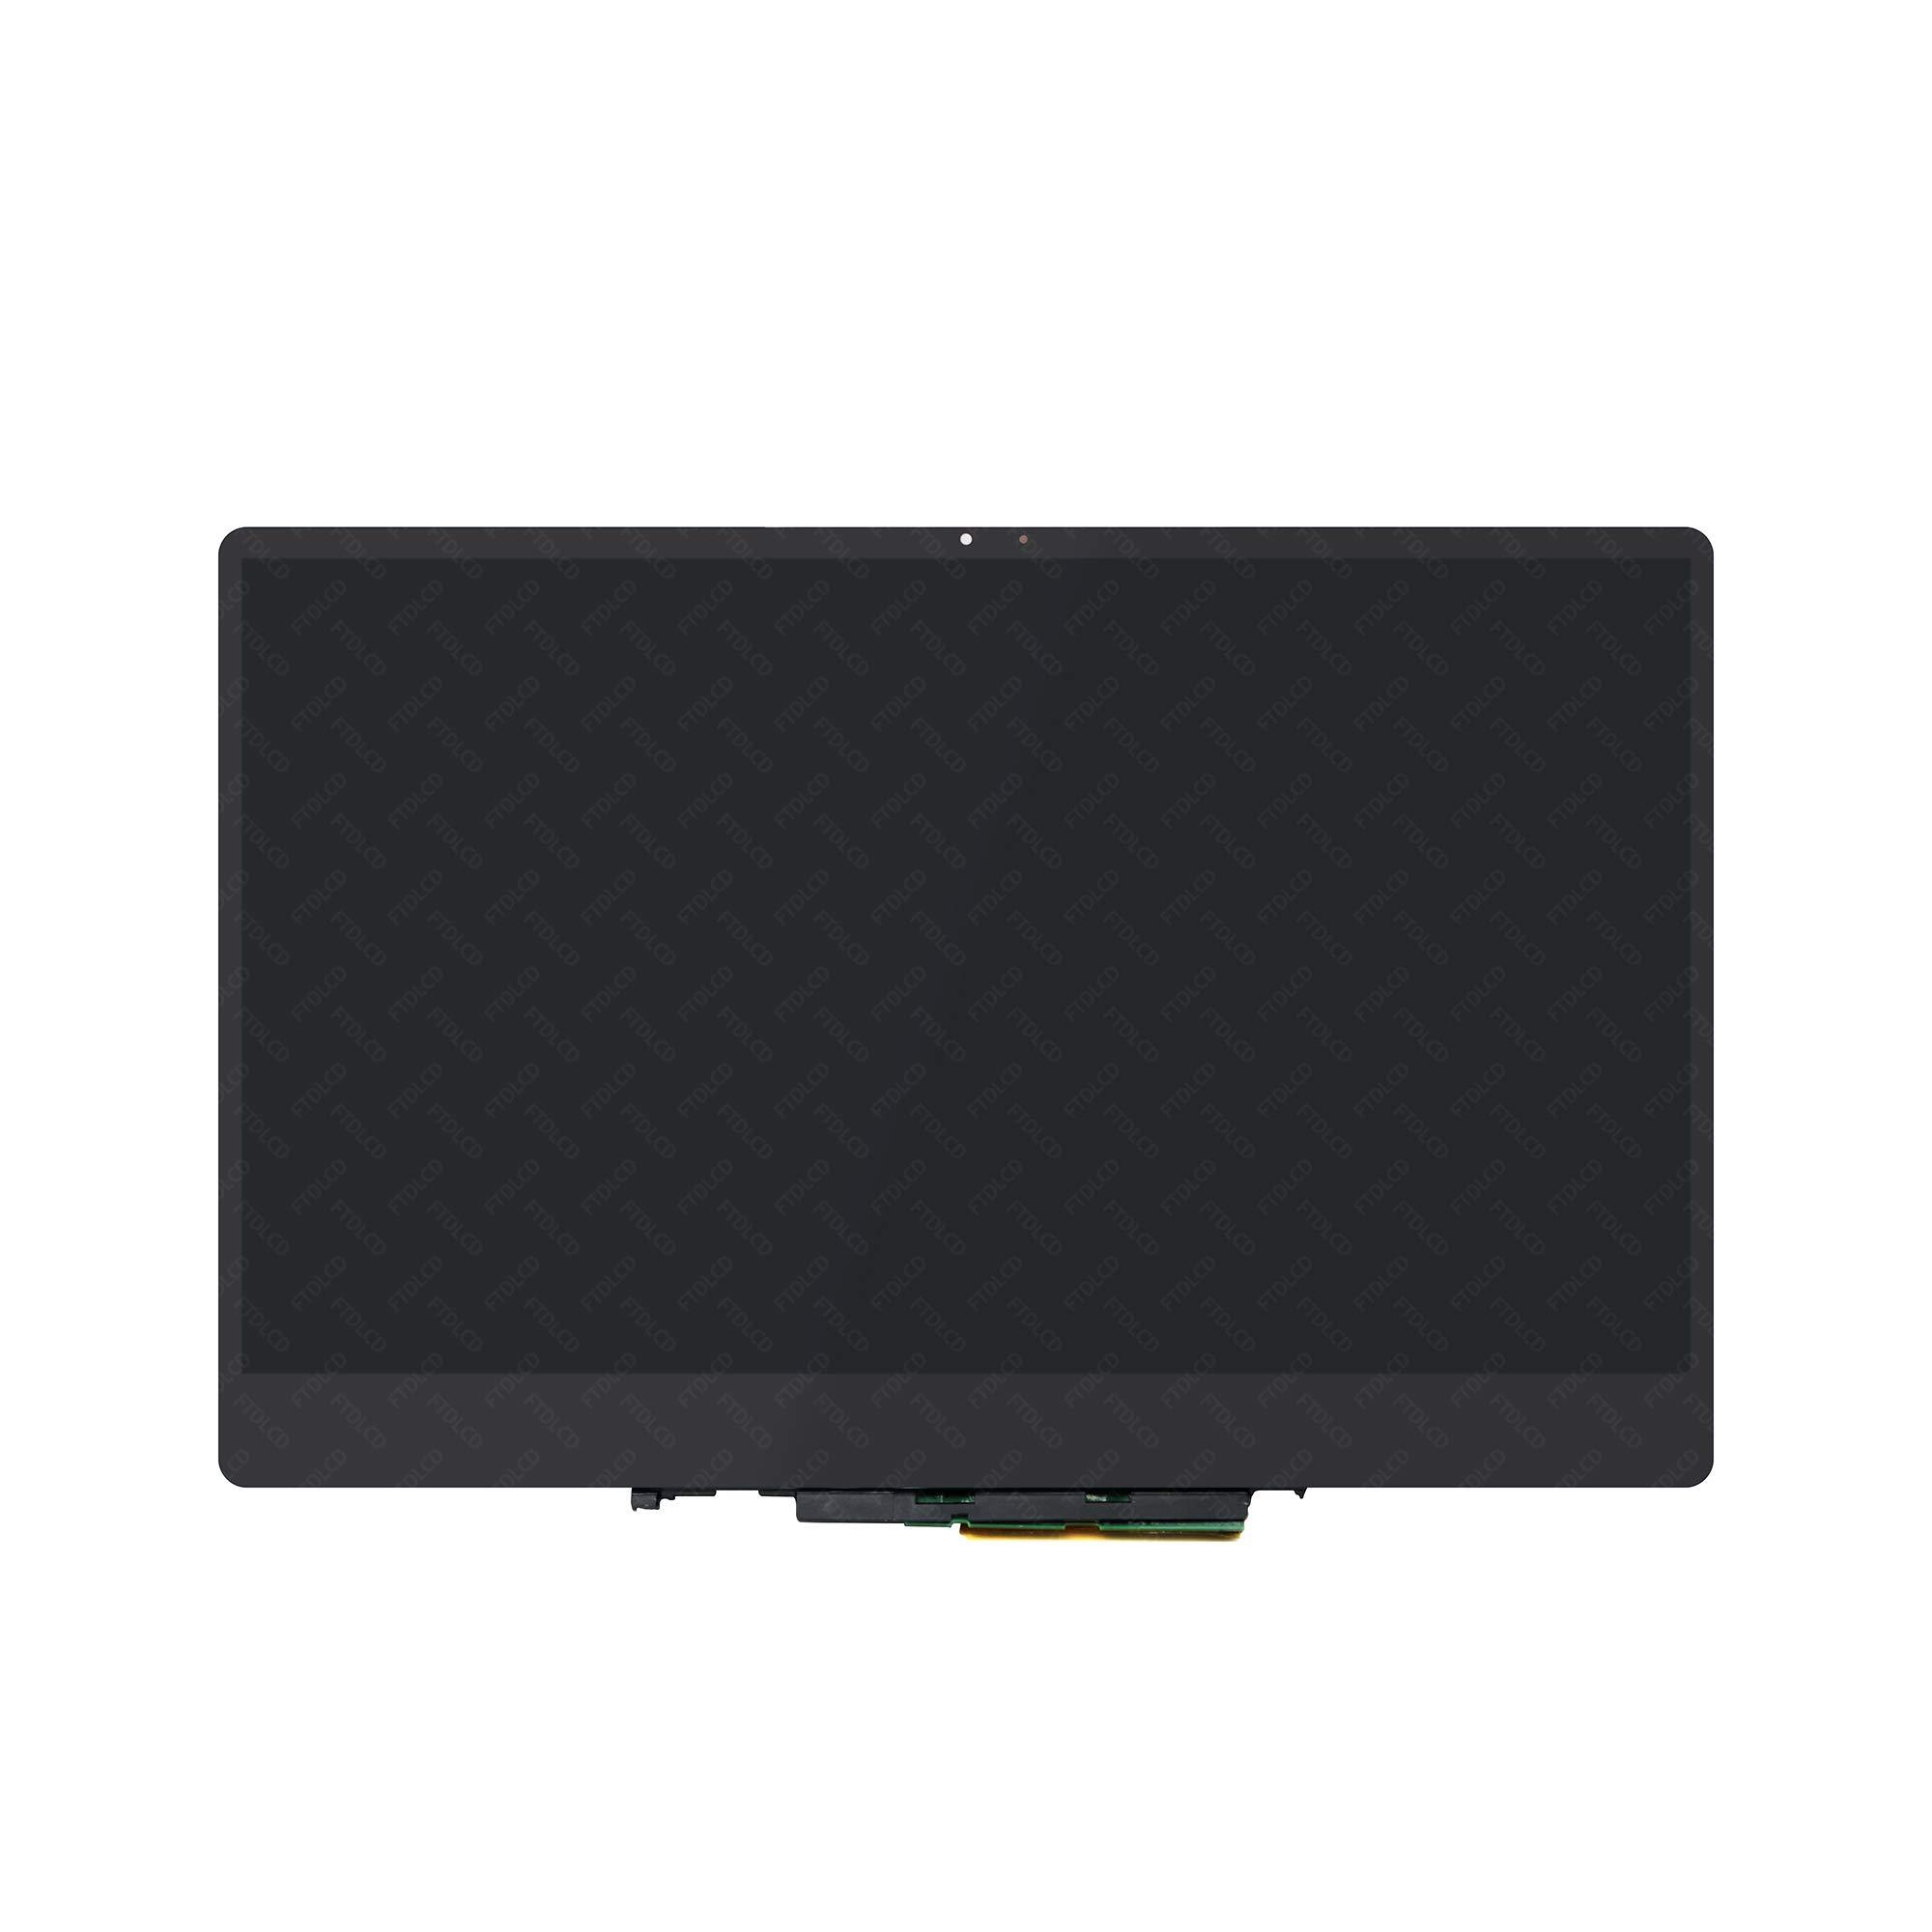 FTDLCD® Para DELL Inspiron 13 7386 13.3 Inch Digitalizador de LCD Pantalla Táctil FHD +Marco B133HAN06.2 Repuesto Asamblea 1920x1080: Amazon.es: Electrónica